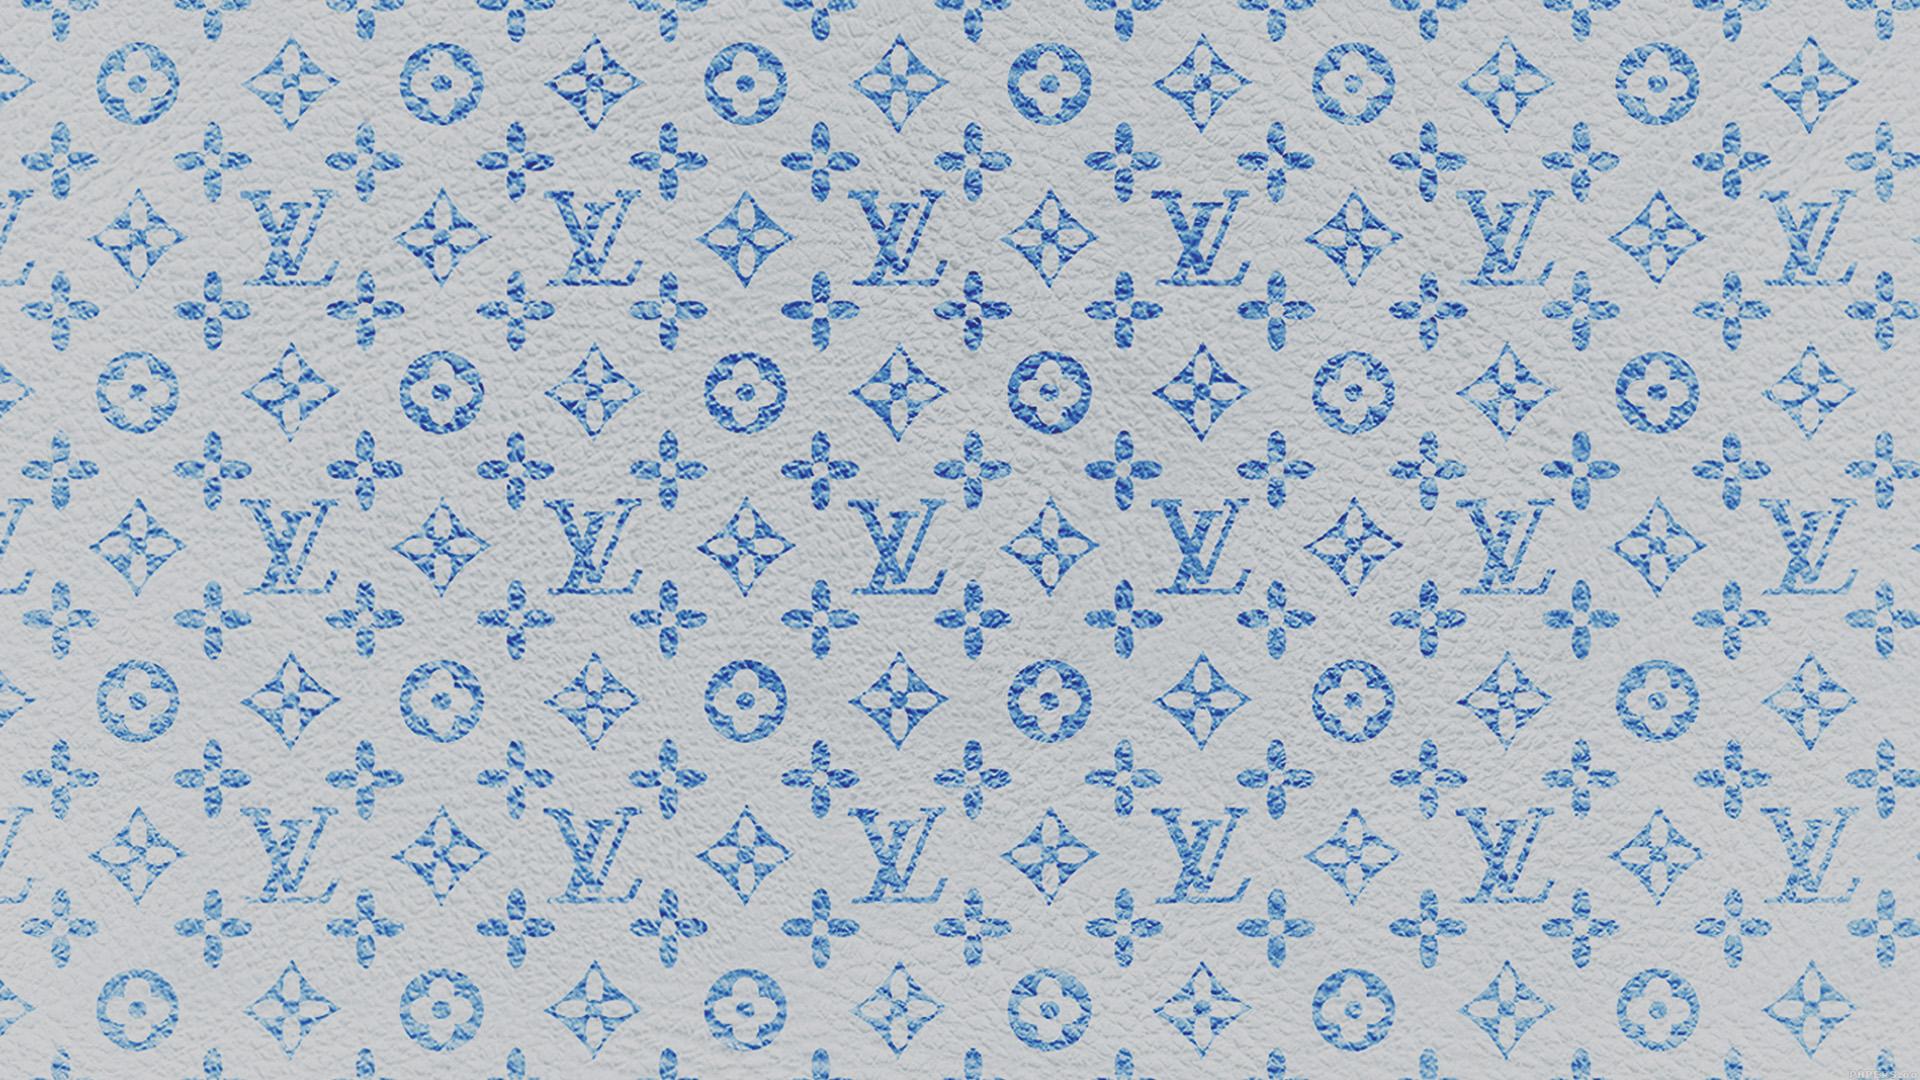 vf21 louis vuitton blue pattern art